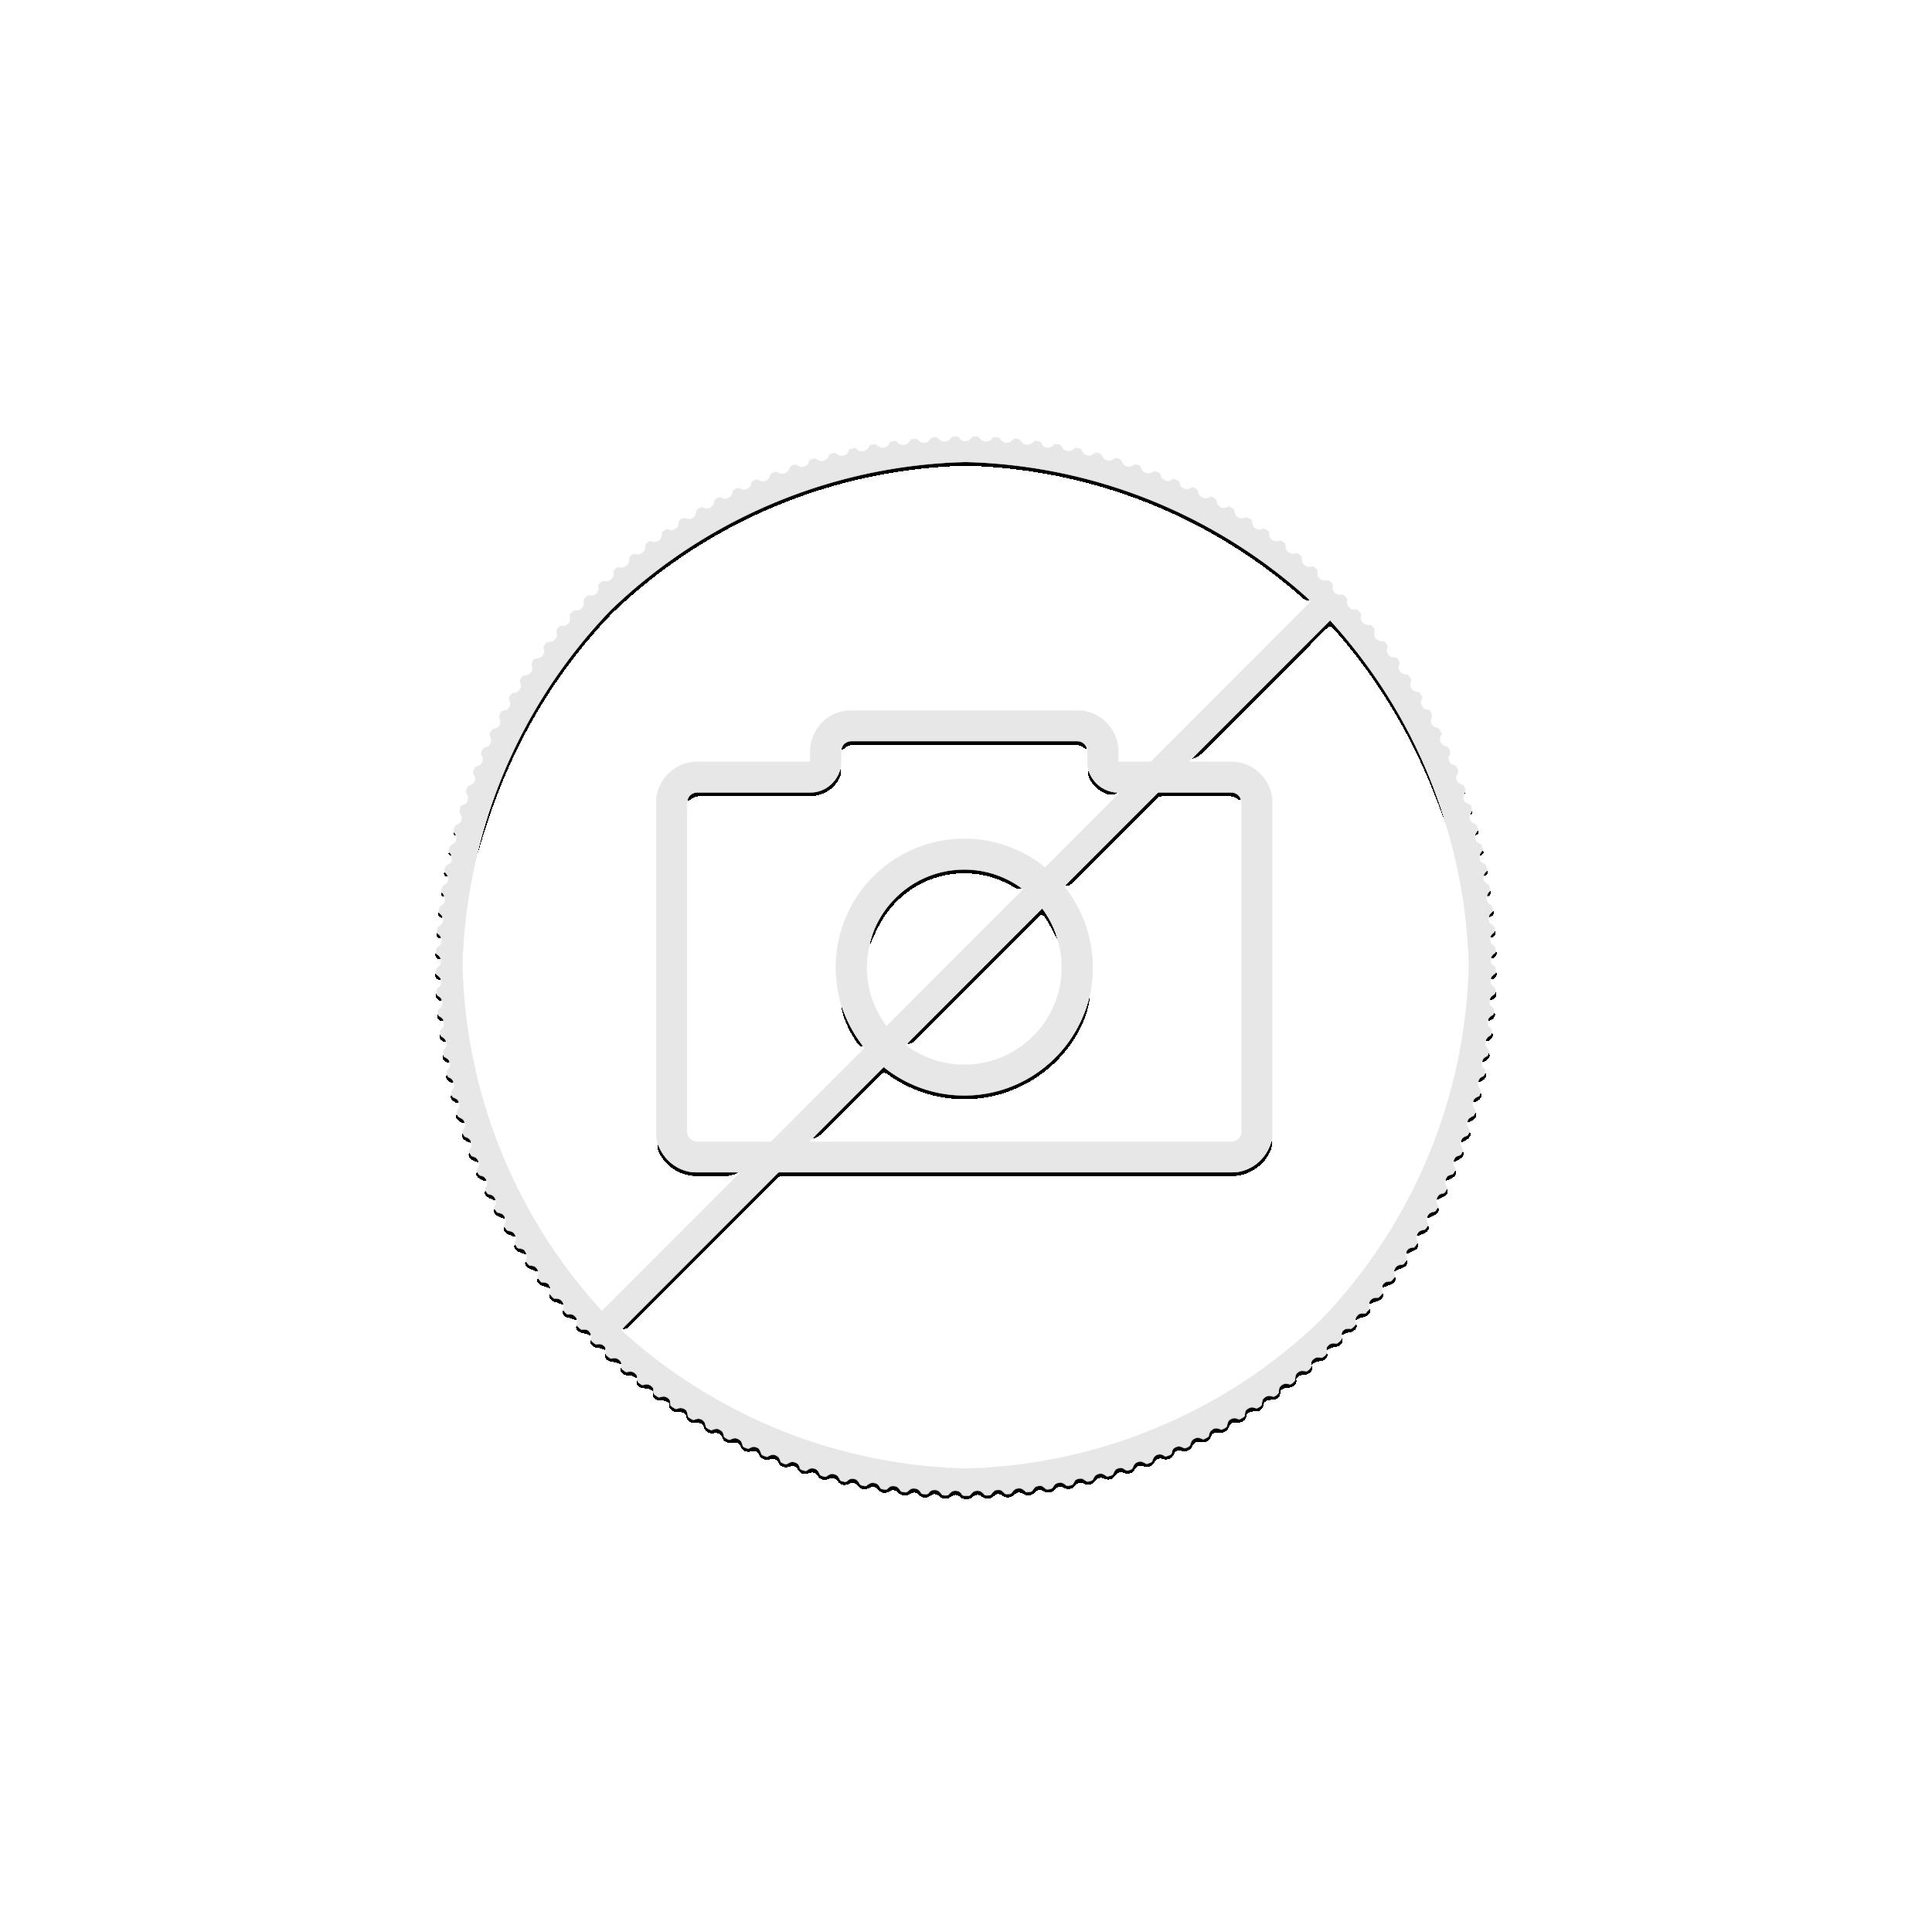 30 Gram gouden Panda munten 2017